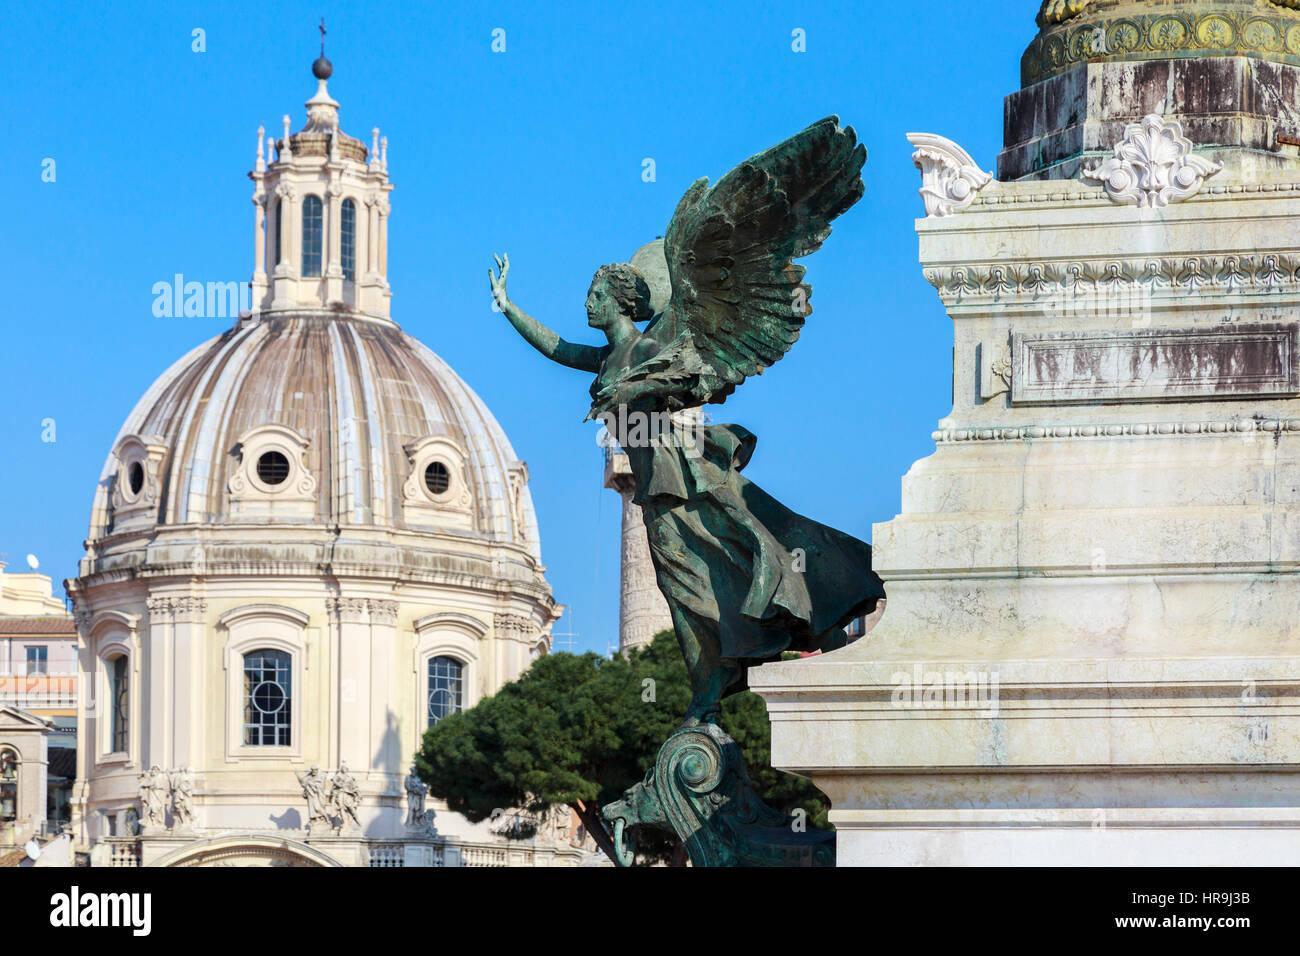 Statue detail outside monument to Vittorio Emanuele,  Via San Marco, Piazza Venezia, Rome, Italy - Stock Image